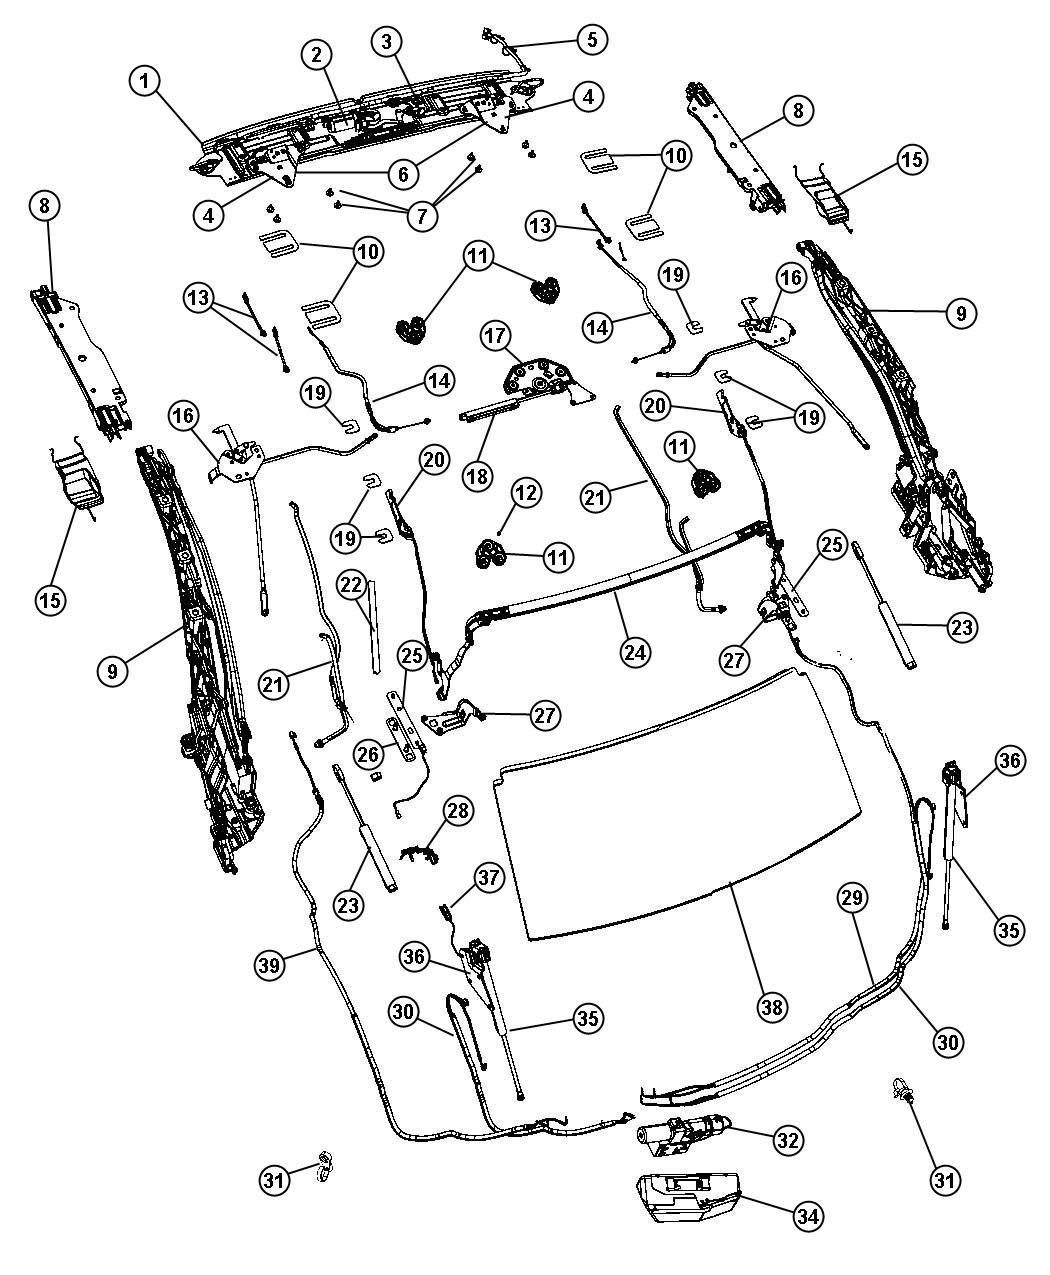 Cadillac Deville Fuse Box Diagram Cadillac Wiring